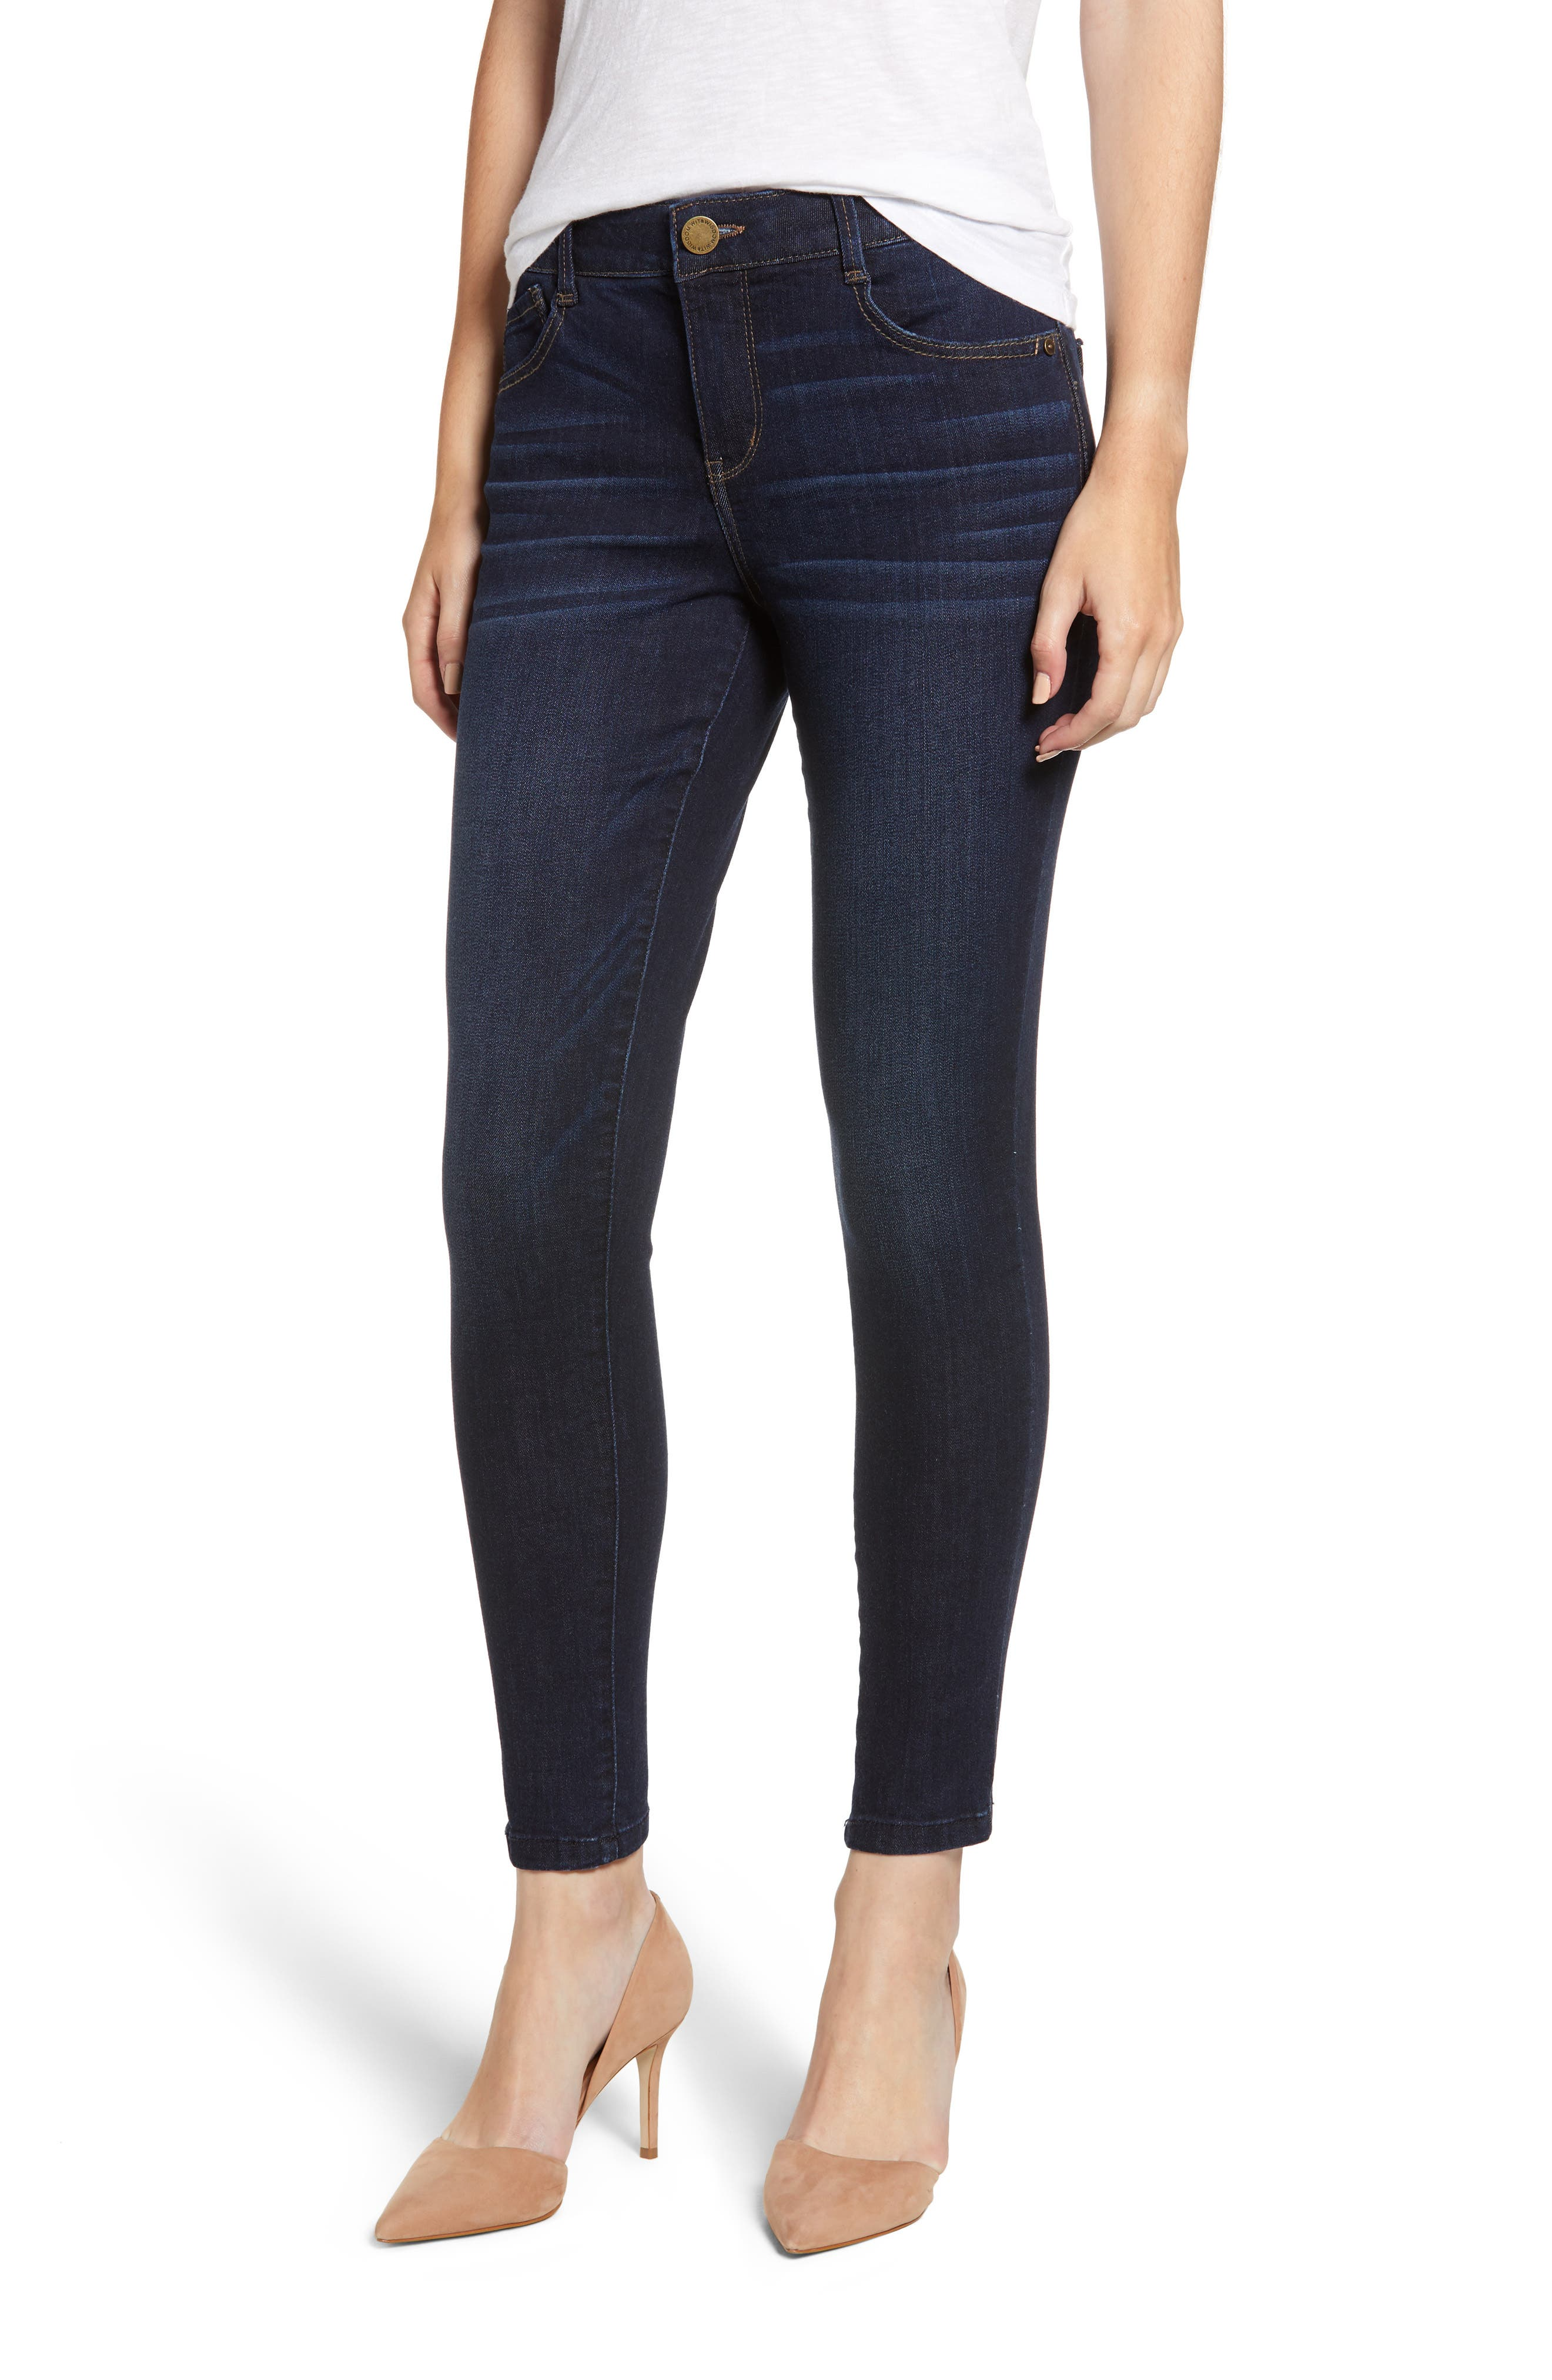 Women's Wit & Wisdom Ab-Solution High Waist Modern Skinny Ankle Jeans